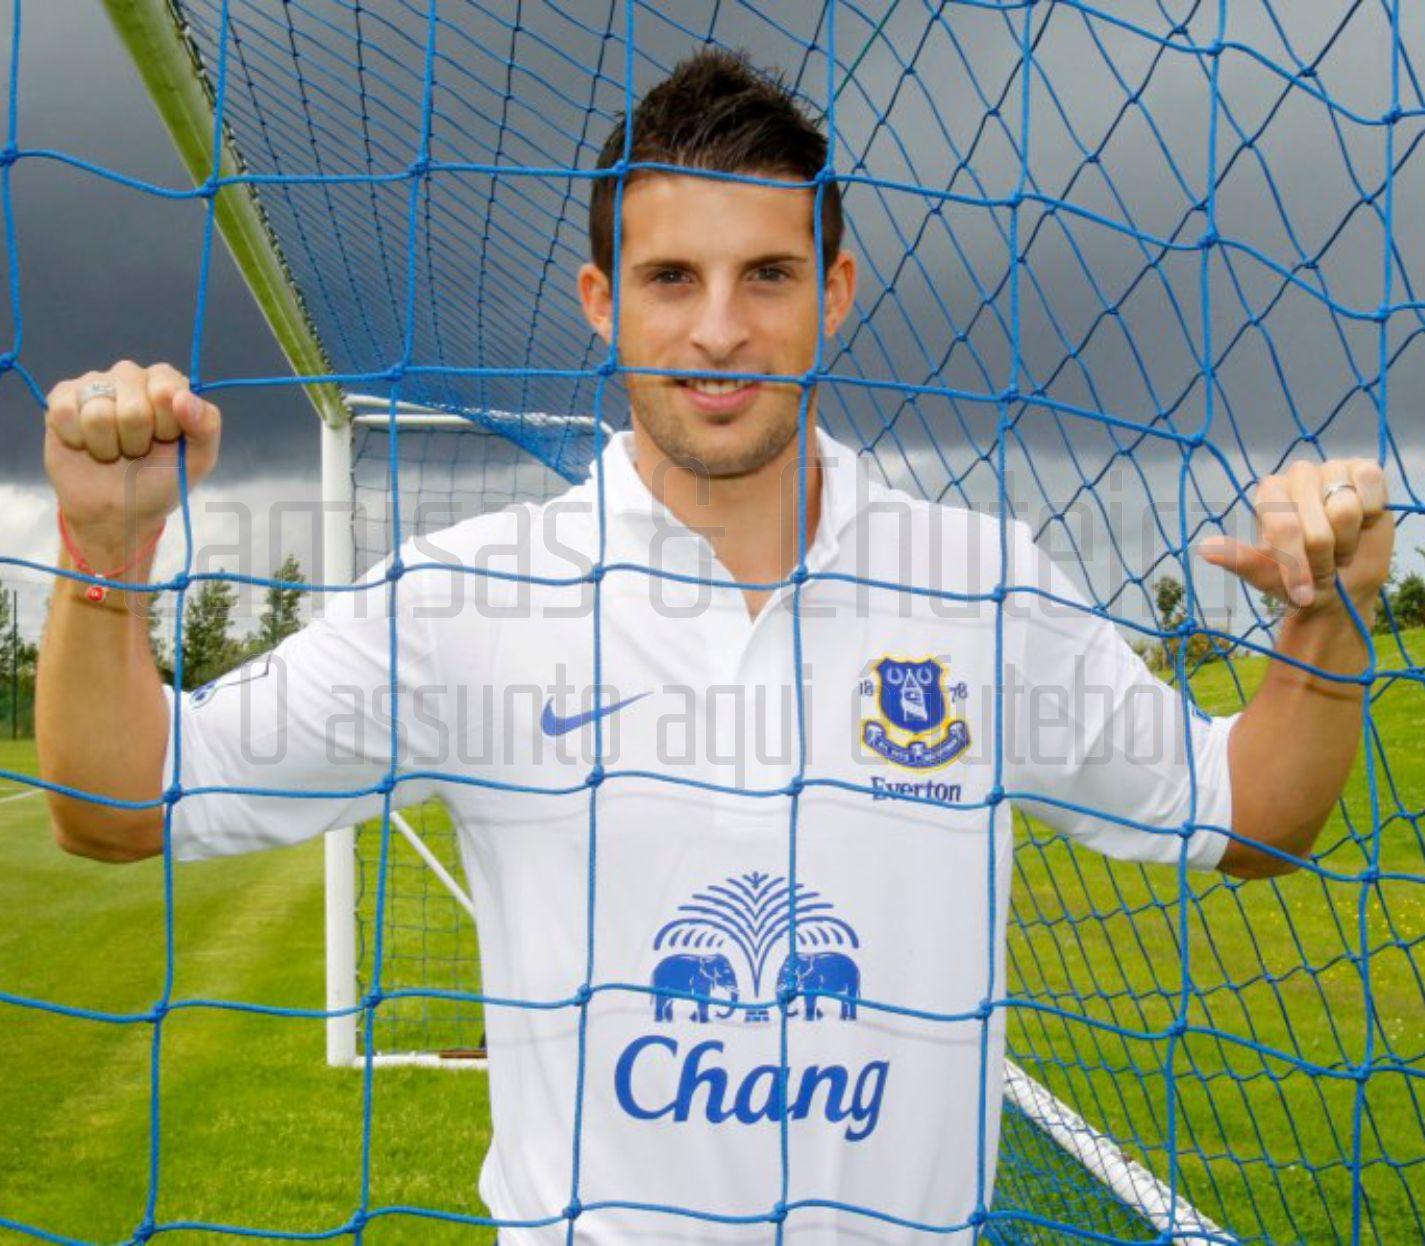 Everton 3e Shirt 2012/2013